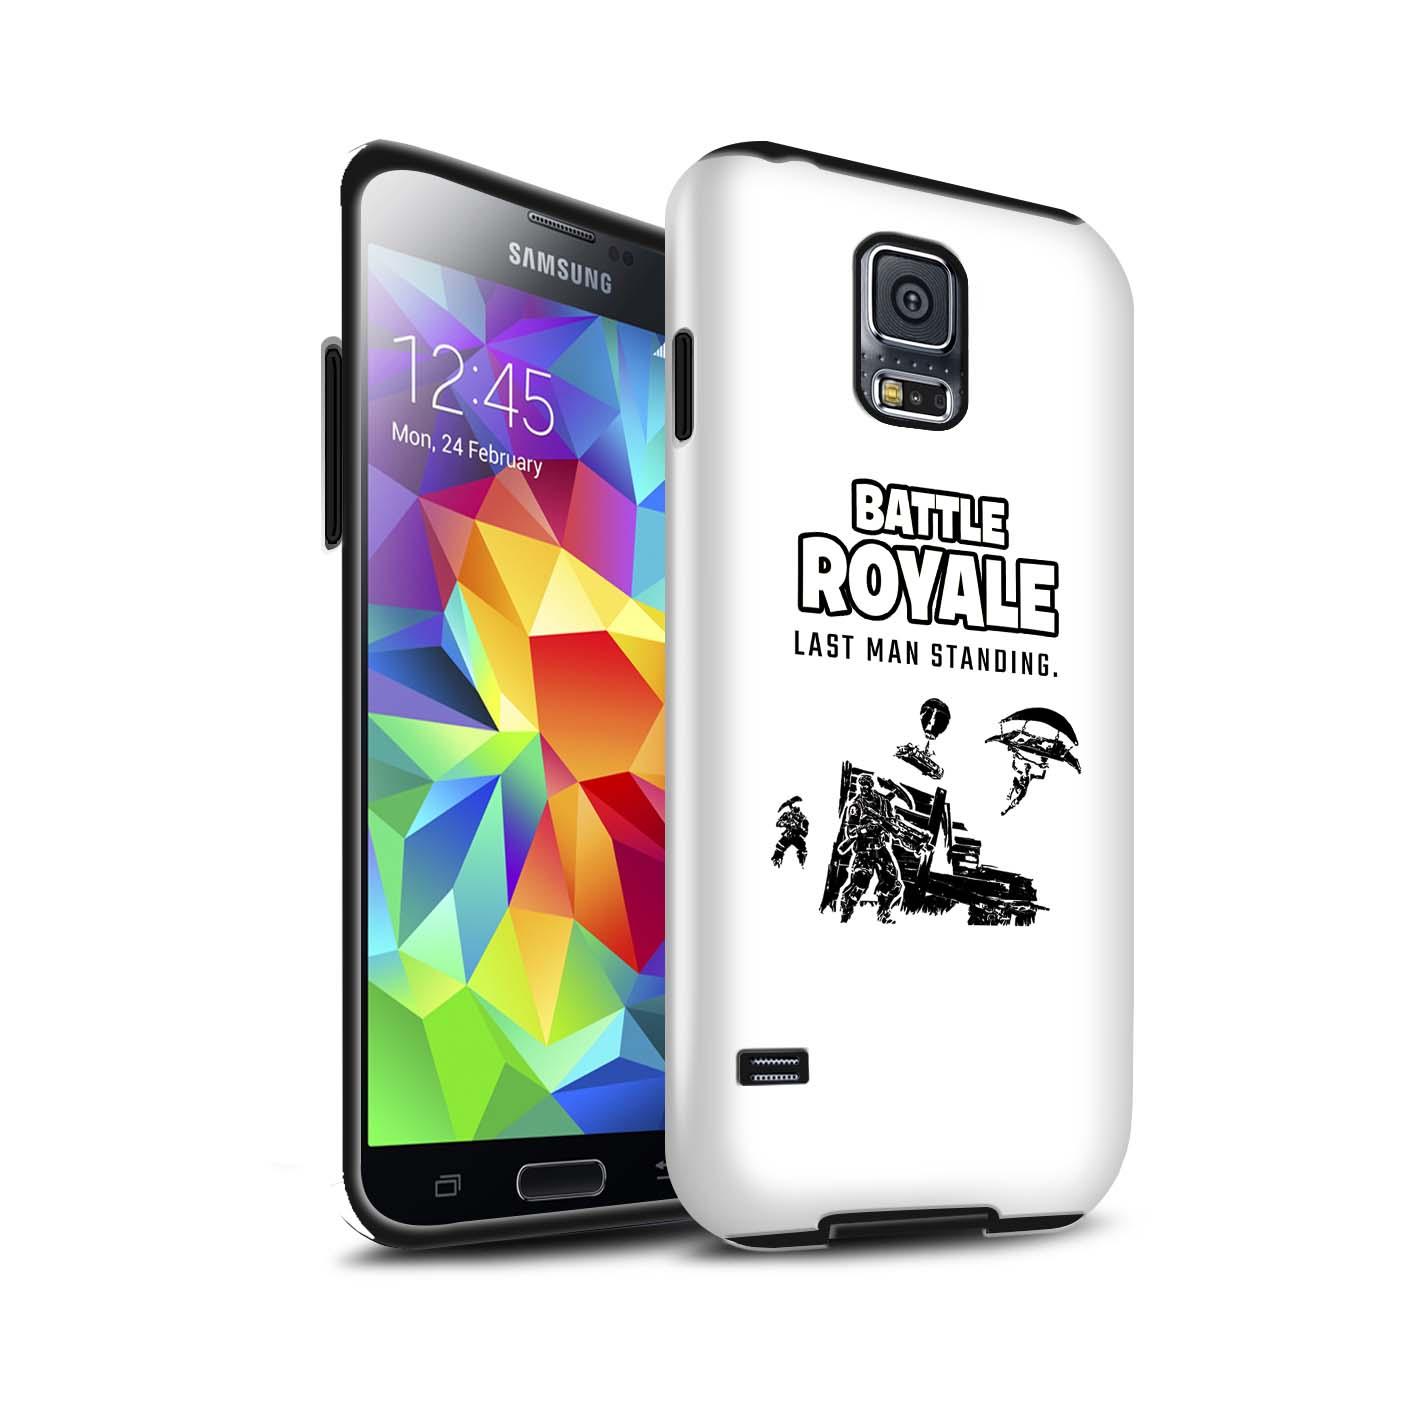 STUFF4-Matte-Tough-Phone-Case-for-Samsung-Galaxy-S5-SV-FN-Battle-Royale